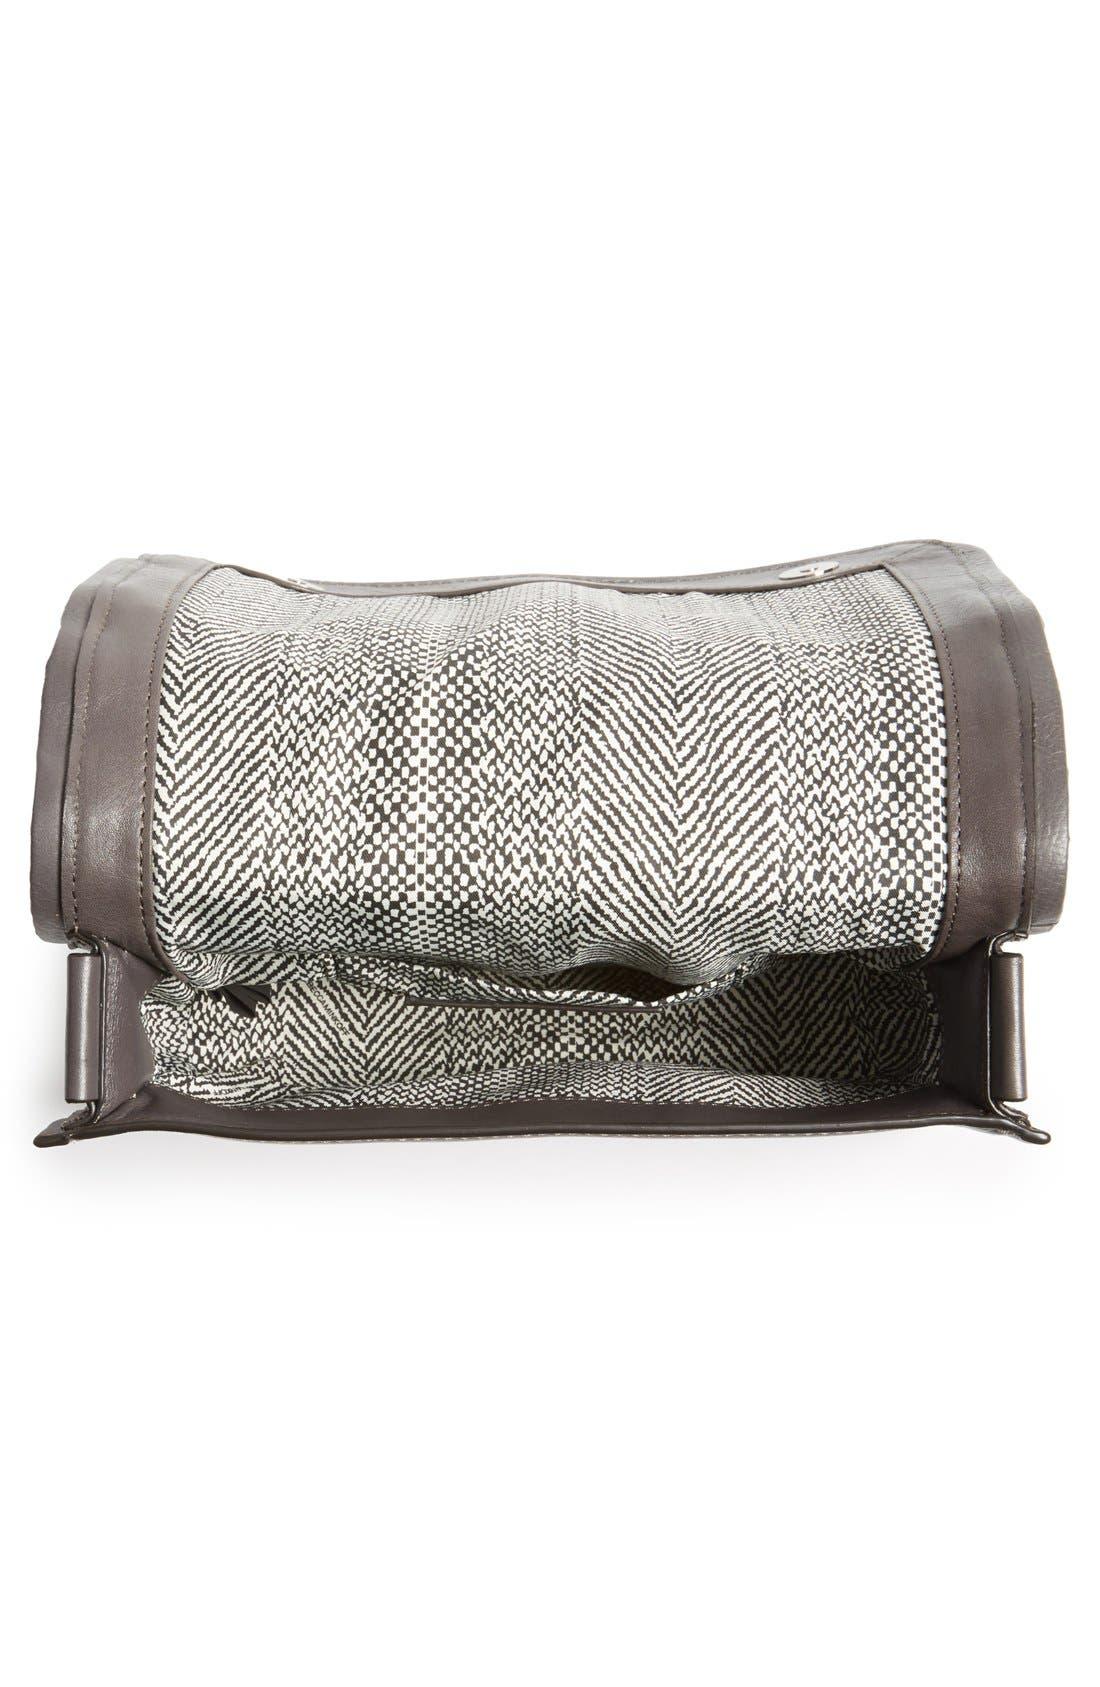 Alternate Image 3  - Rebecca Minkoff 'Bowery' Convertible Crossbody Bag